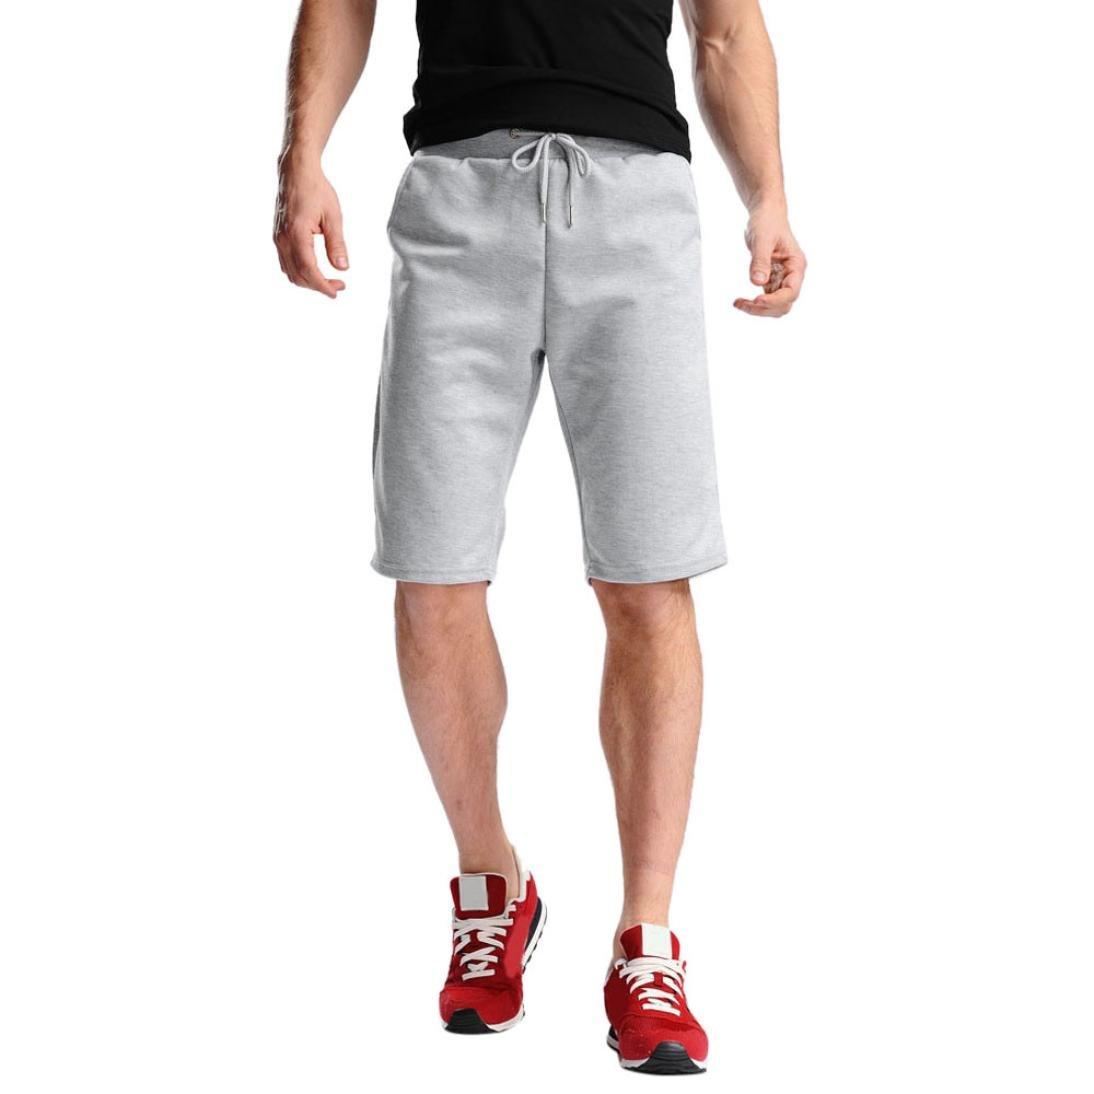 PRINCER Breathable Sweat Shorts Mens Summer Beach Sport Jogging Plain Lightweight Short Pants Casual Shorts Pants Knickers Breechcloth Plus Size 4XL